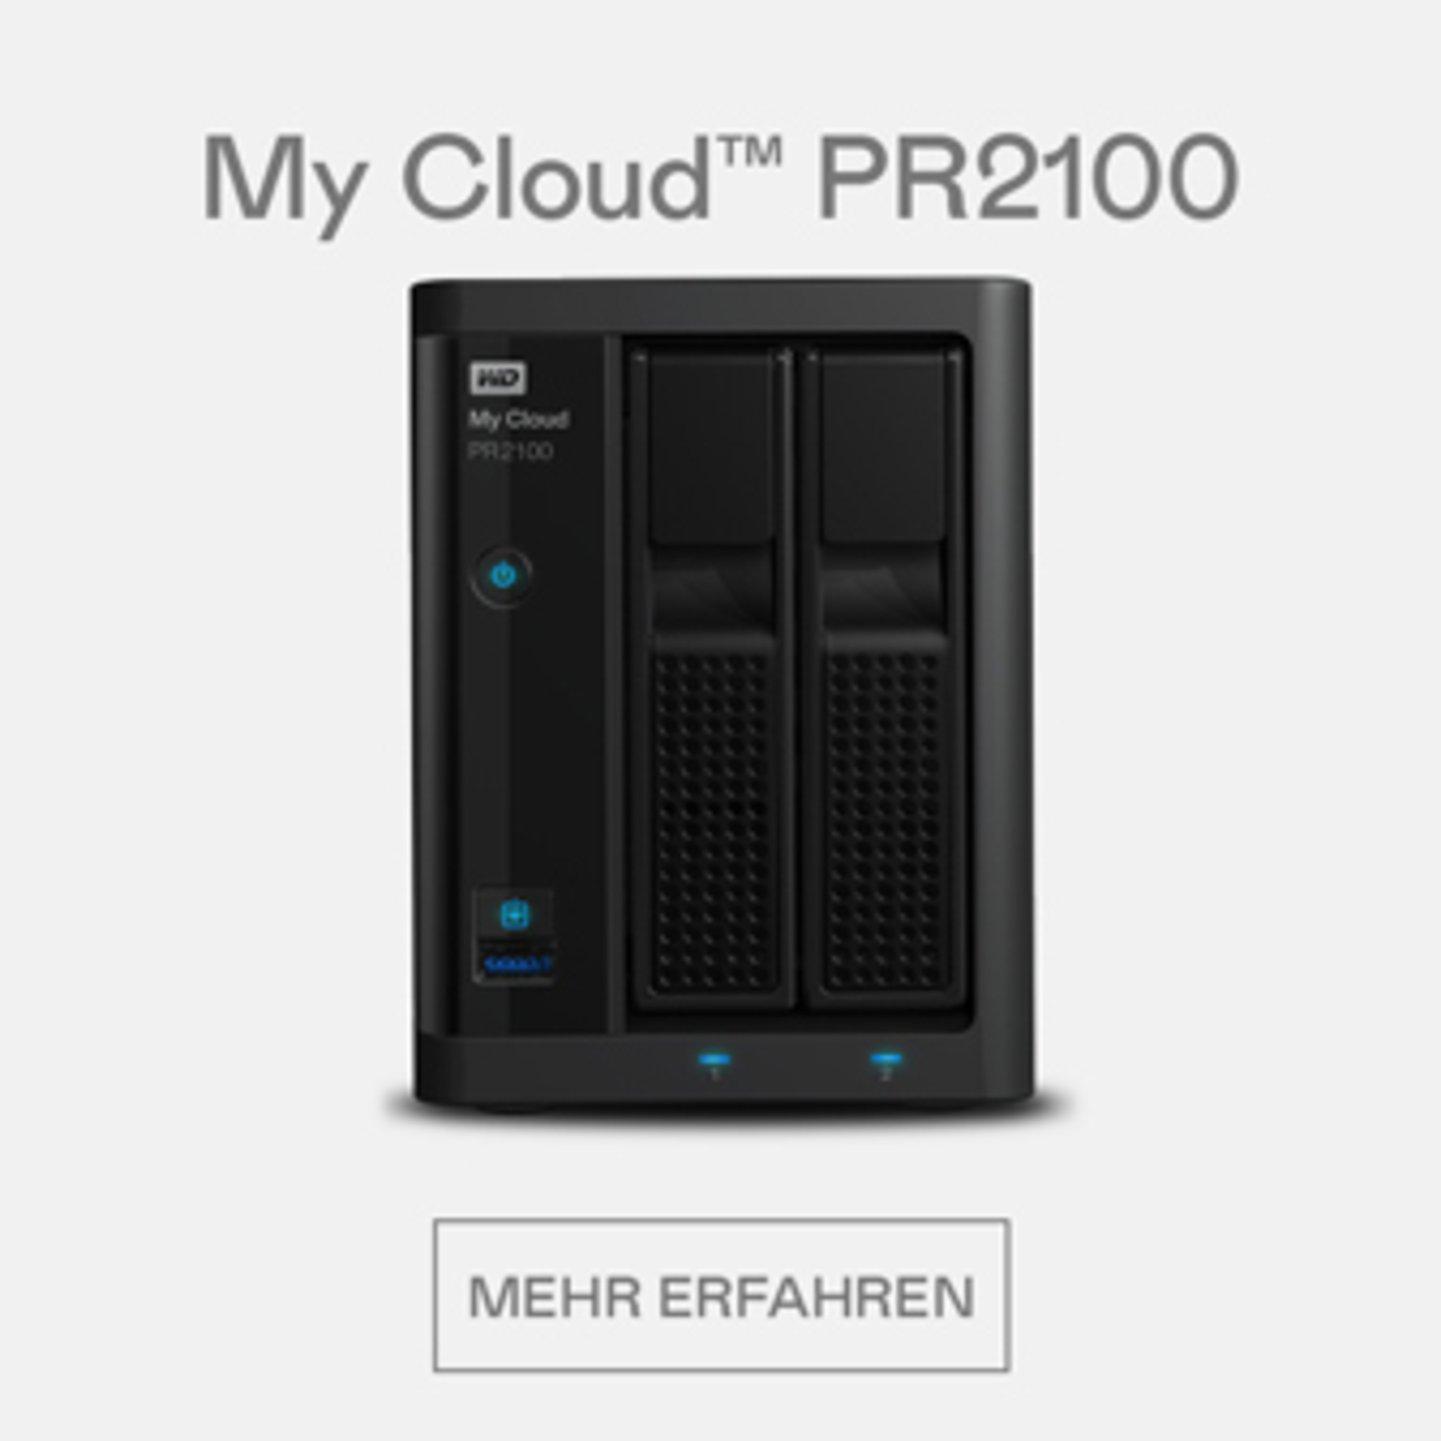 My Cloud PR2100